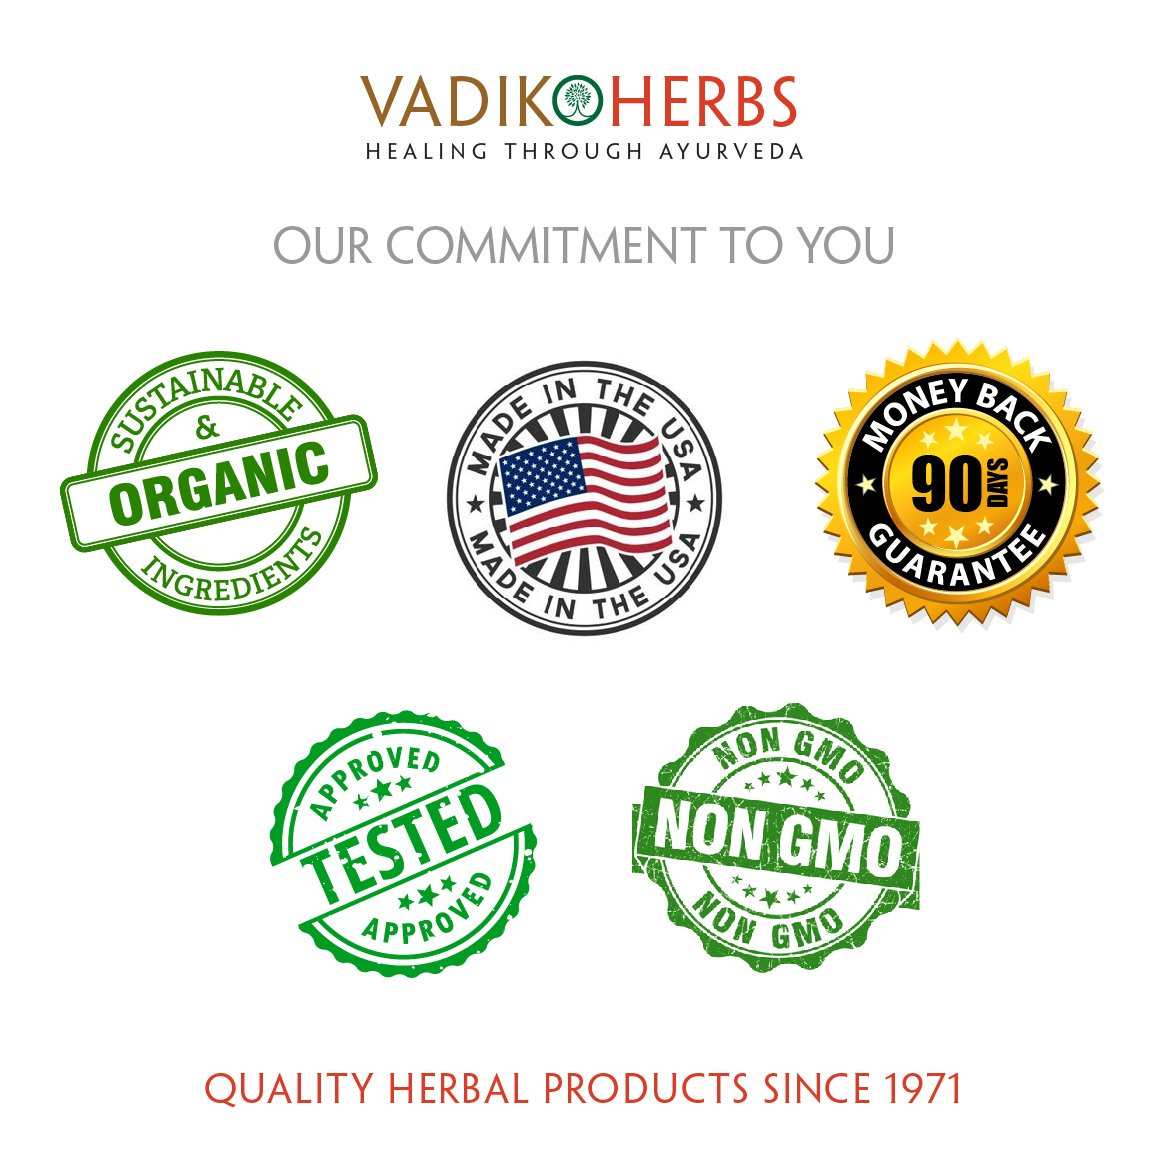 Triphala (Trifala) Powder Organic 160 Veg Capsules by Vadik Herbs | 100% Pure and Natural Super Food Supplement. Non GMO, Gluten Free